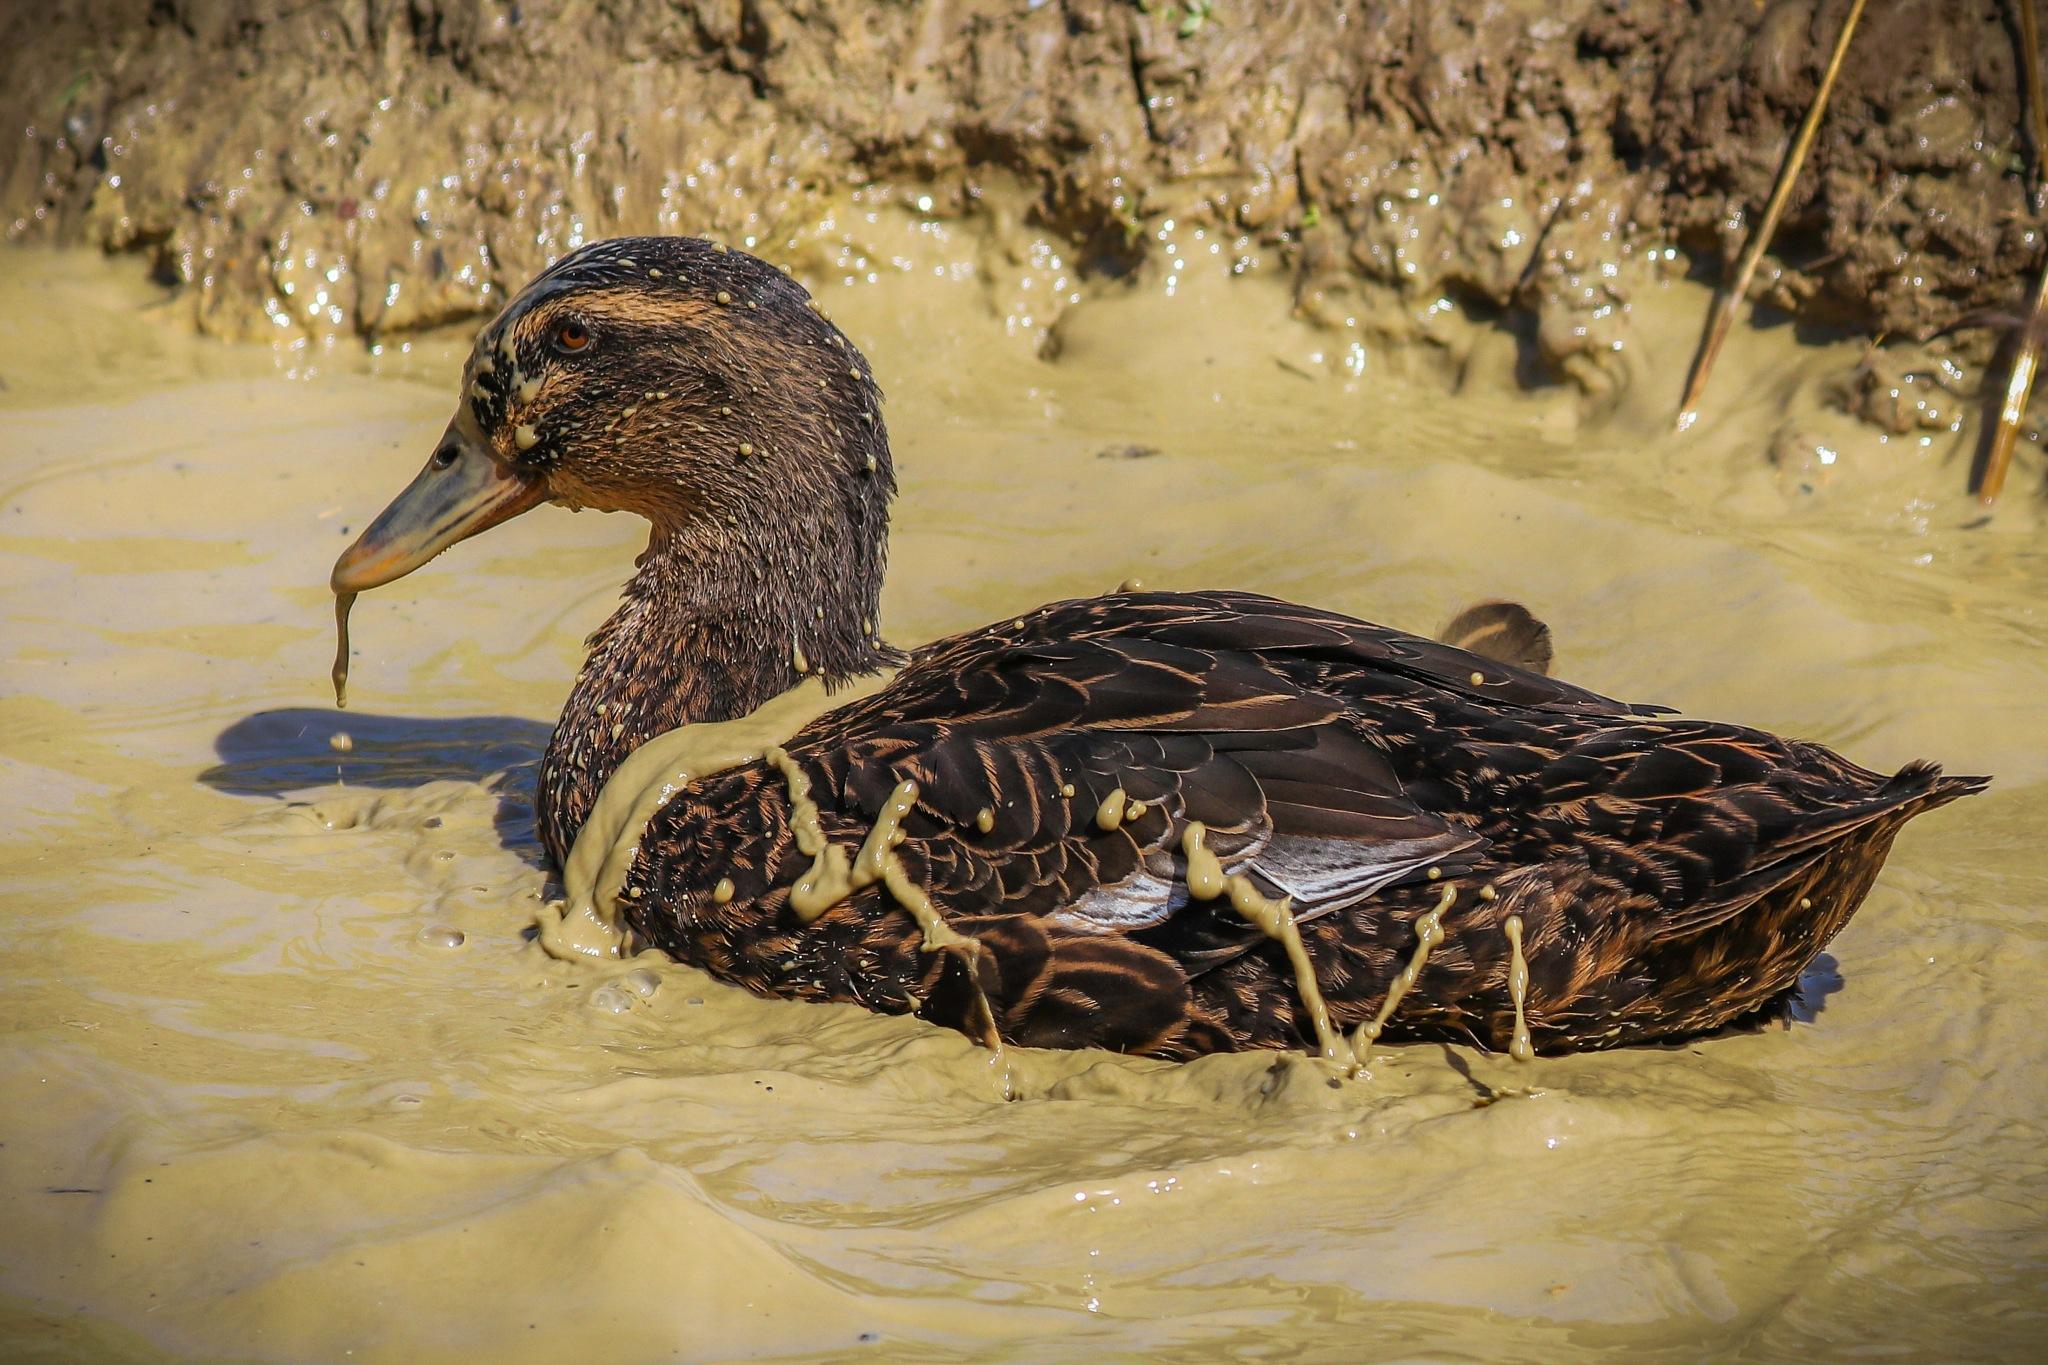 Muddy duck by Mark Hootman